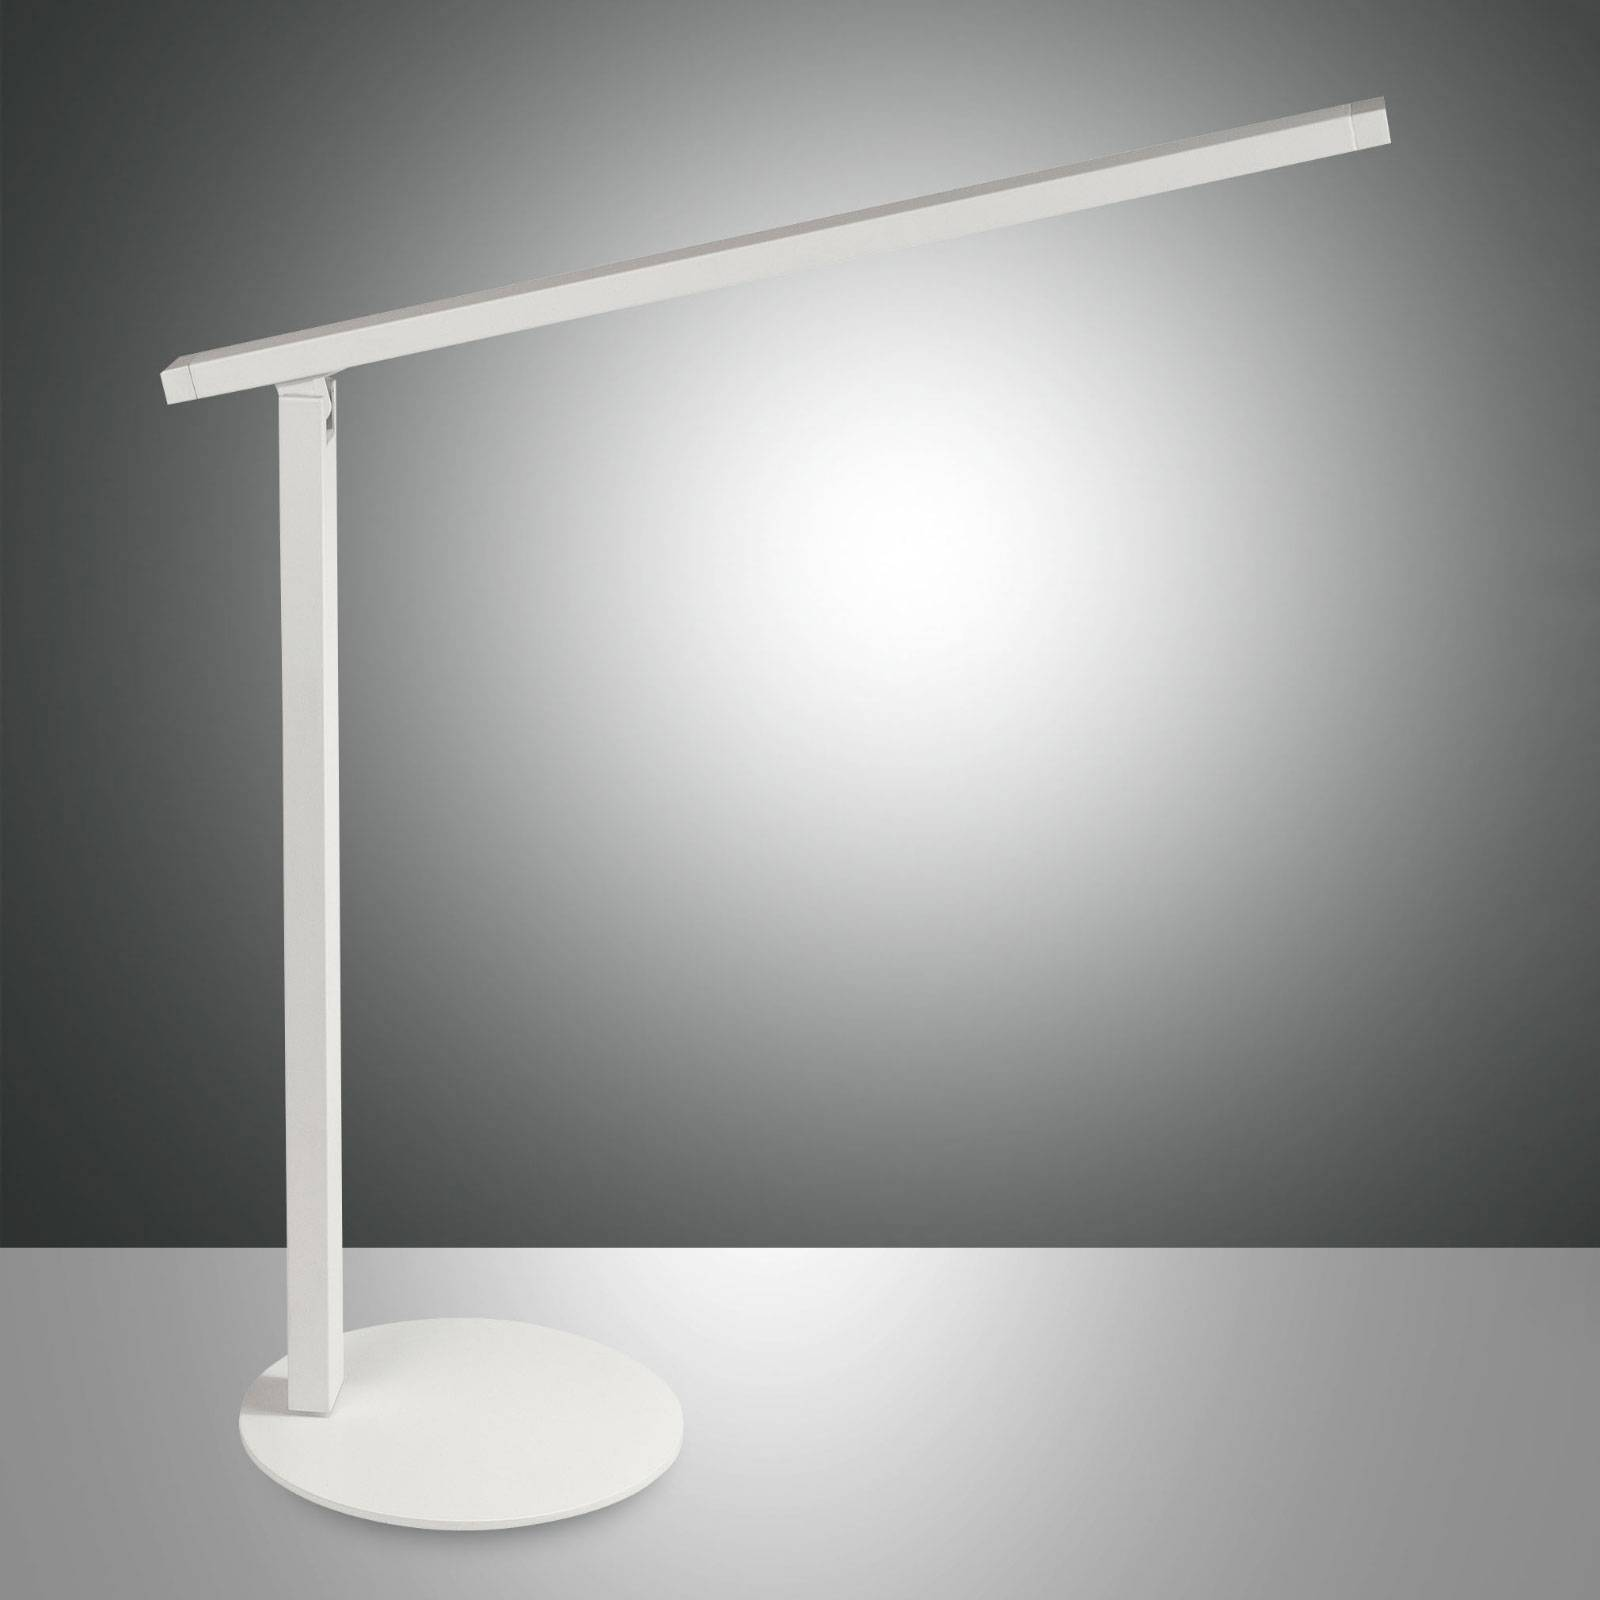 LED bureaulamp Ideal met dimmer, wit